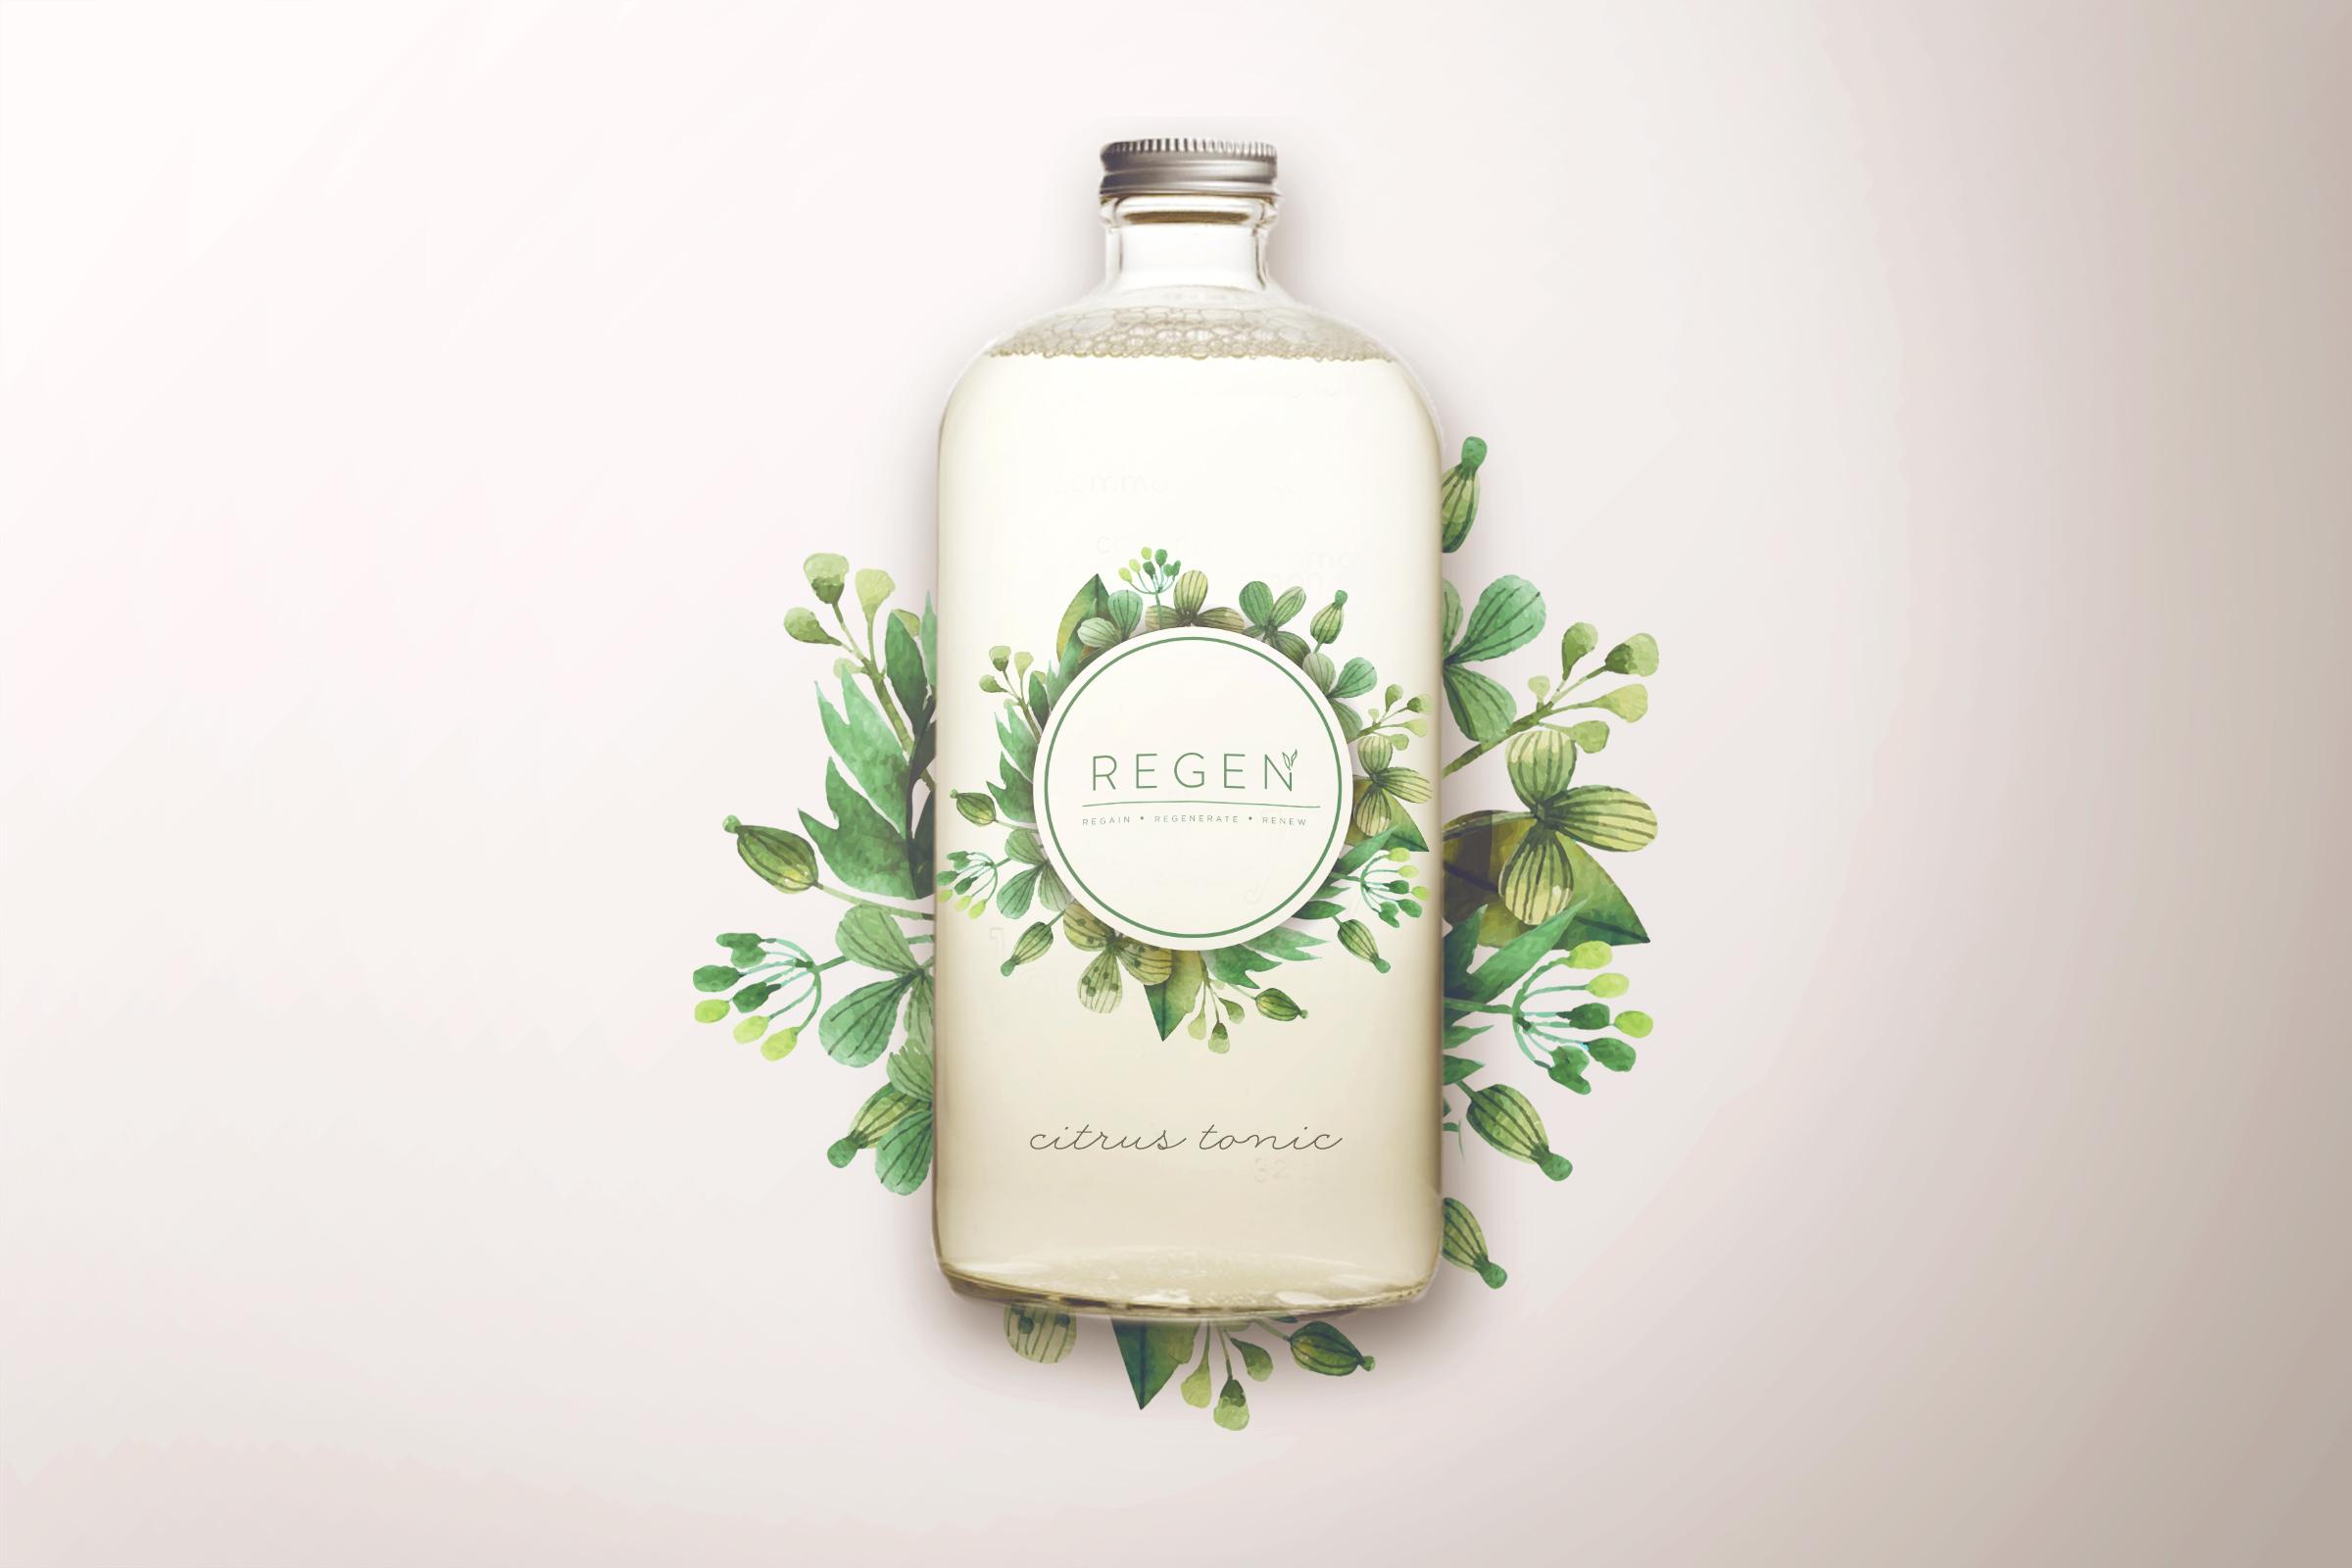 Regen citrus tonic branding printed on bottle with florals surrounding